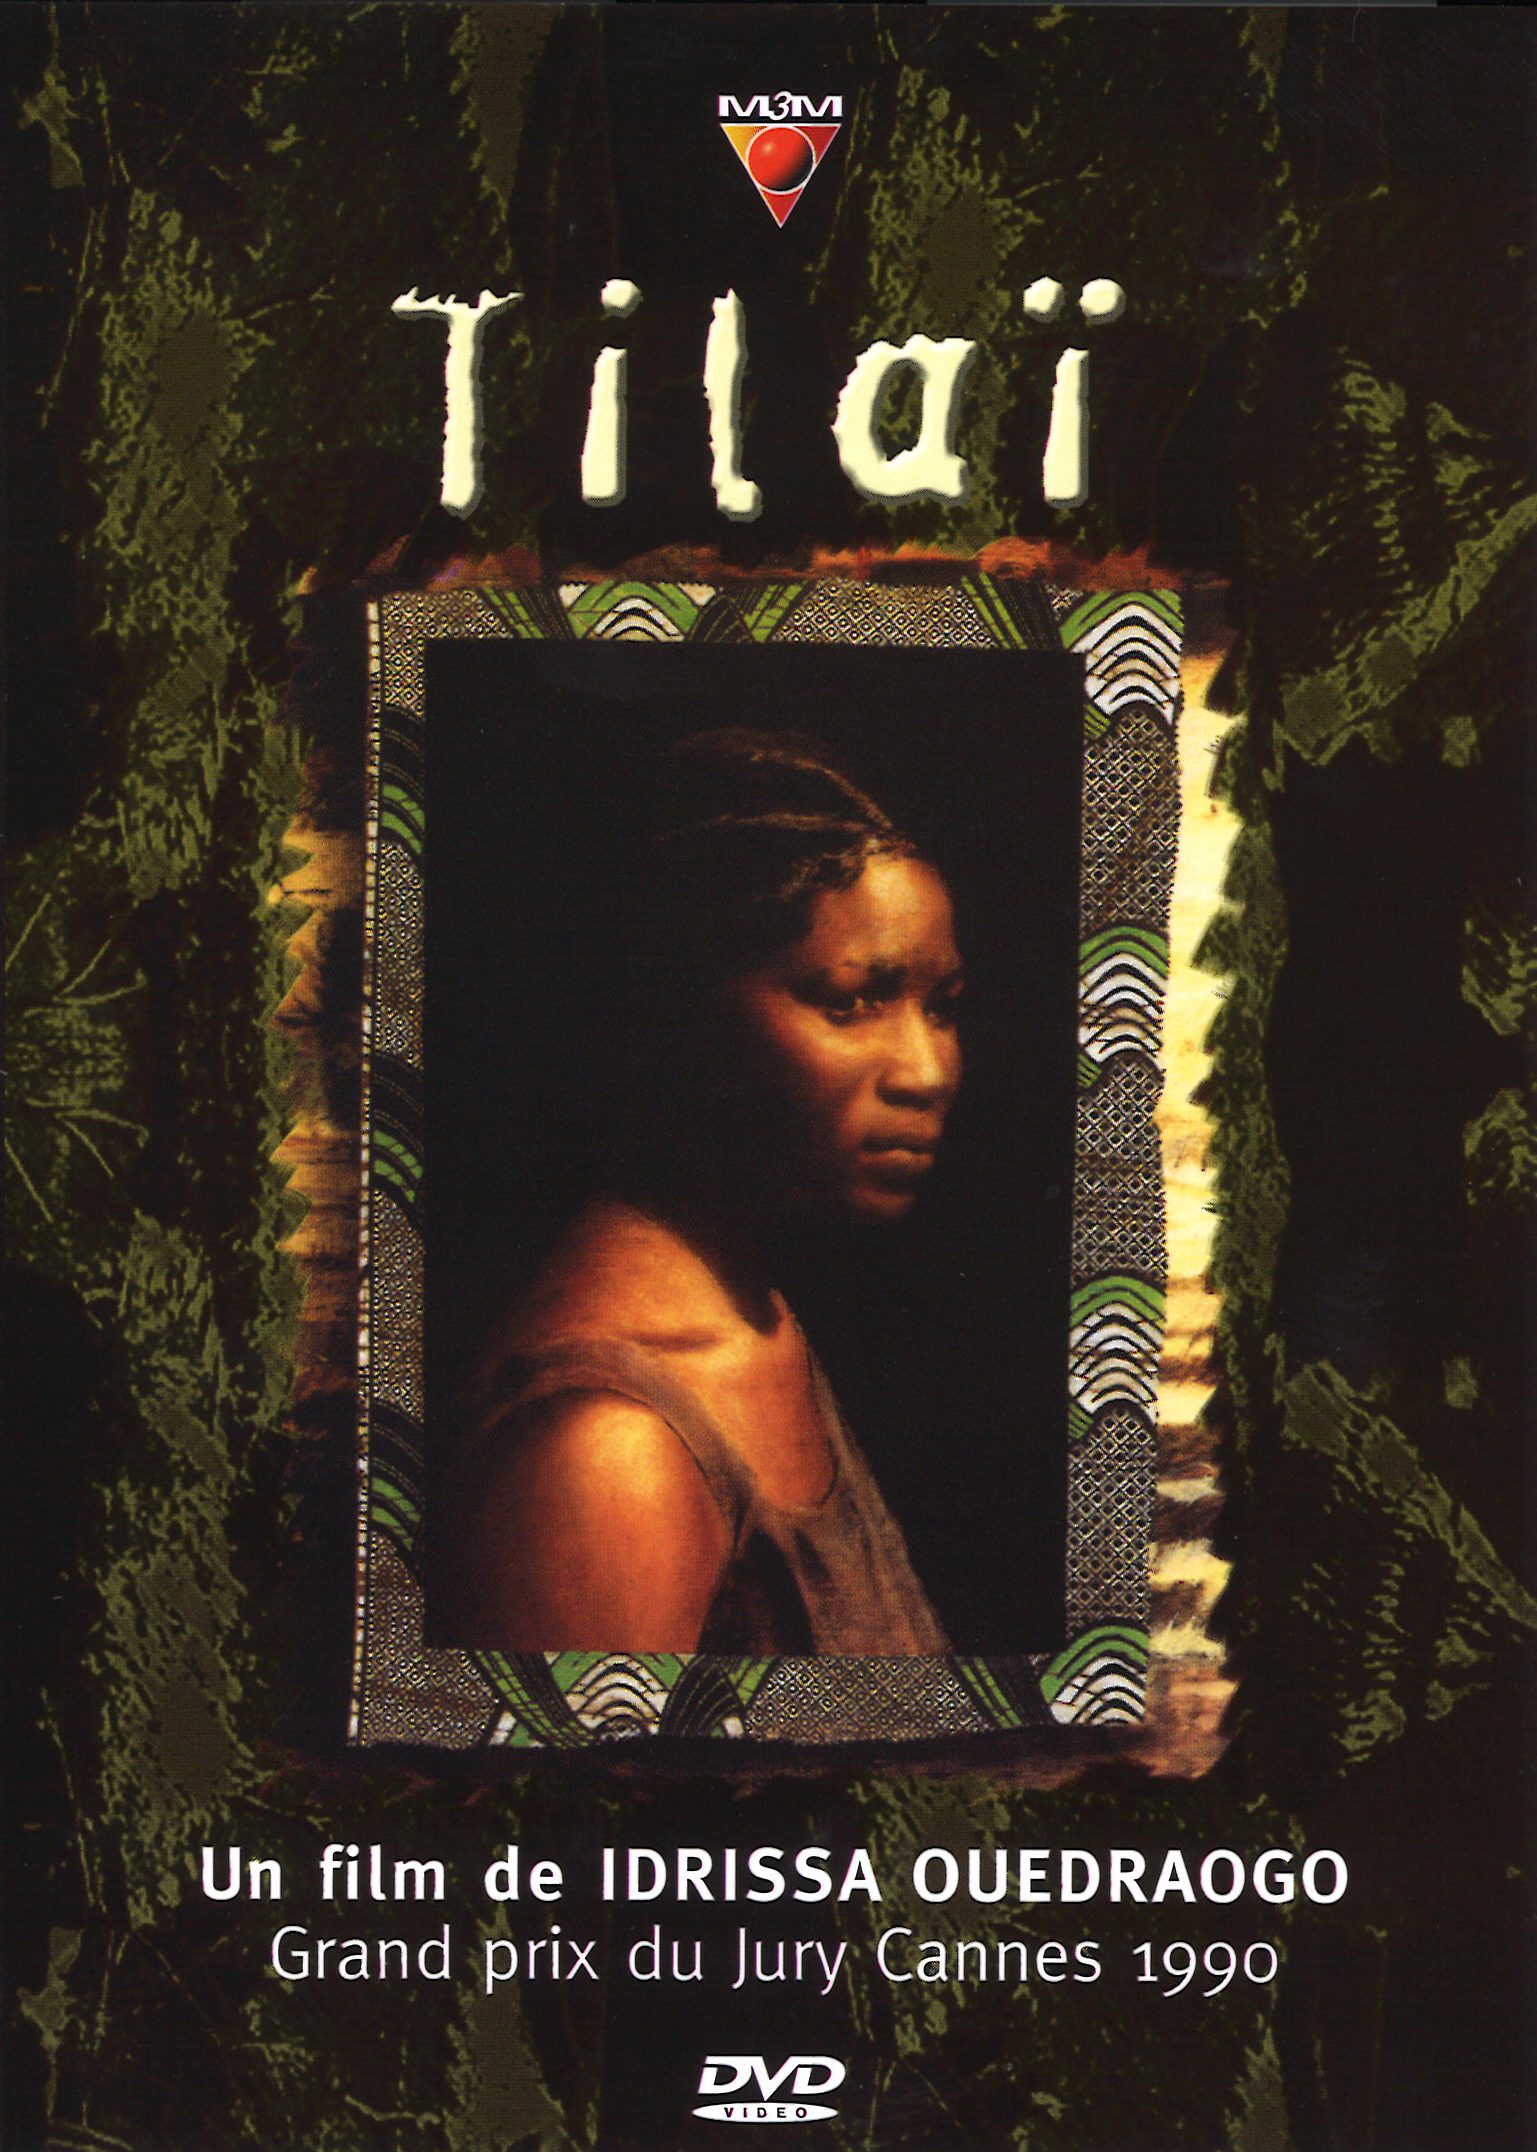 Idrissa Ouédraogo - Tilaï